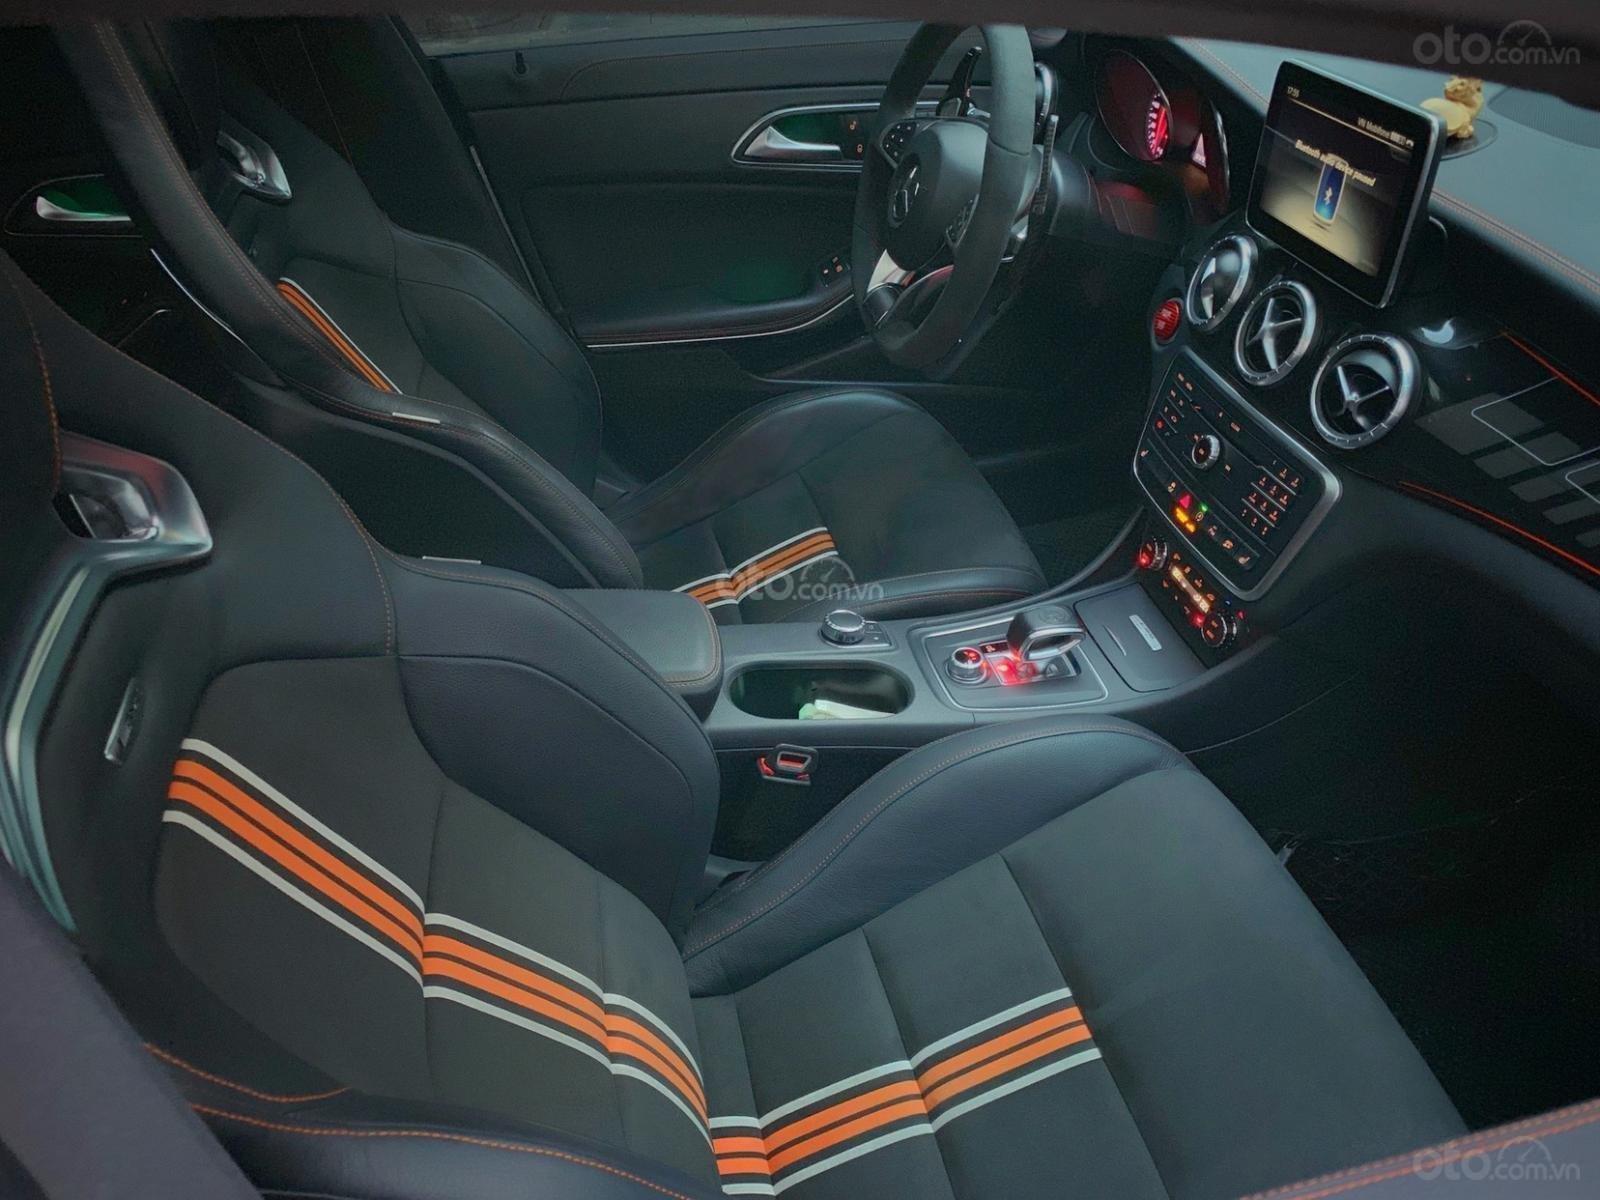 Bán xe Mercedes CLA 45AMG Orange Art đời 2016 full option, giá chỉ 1 tỷ 65 (14)